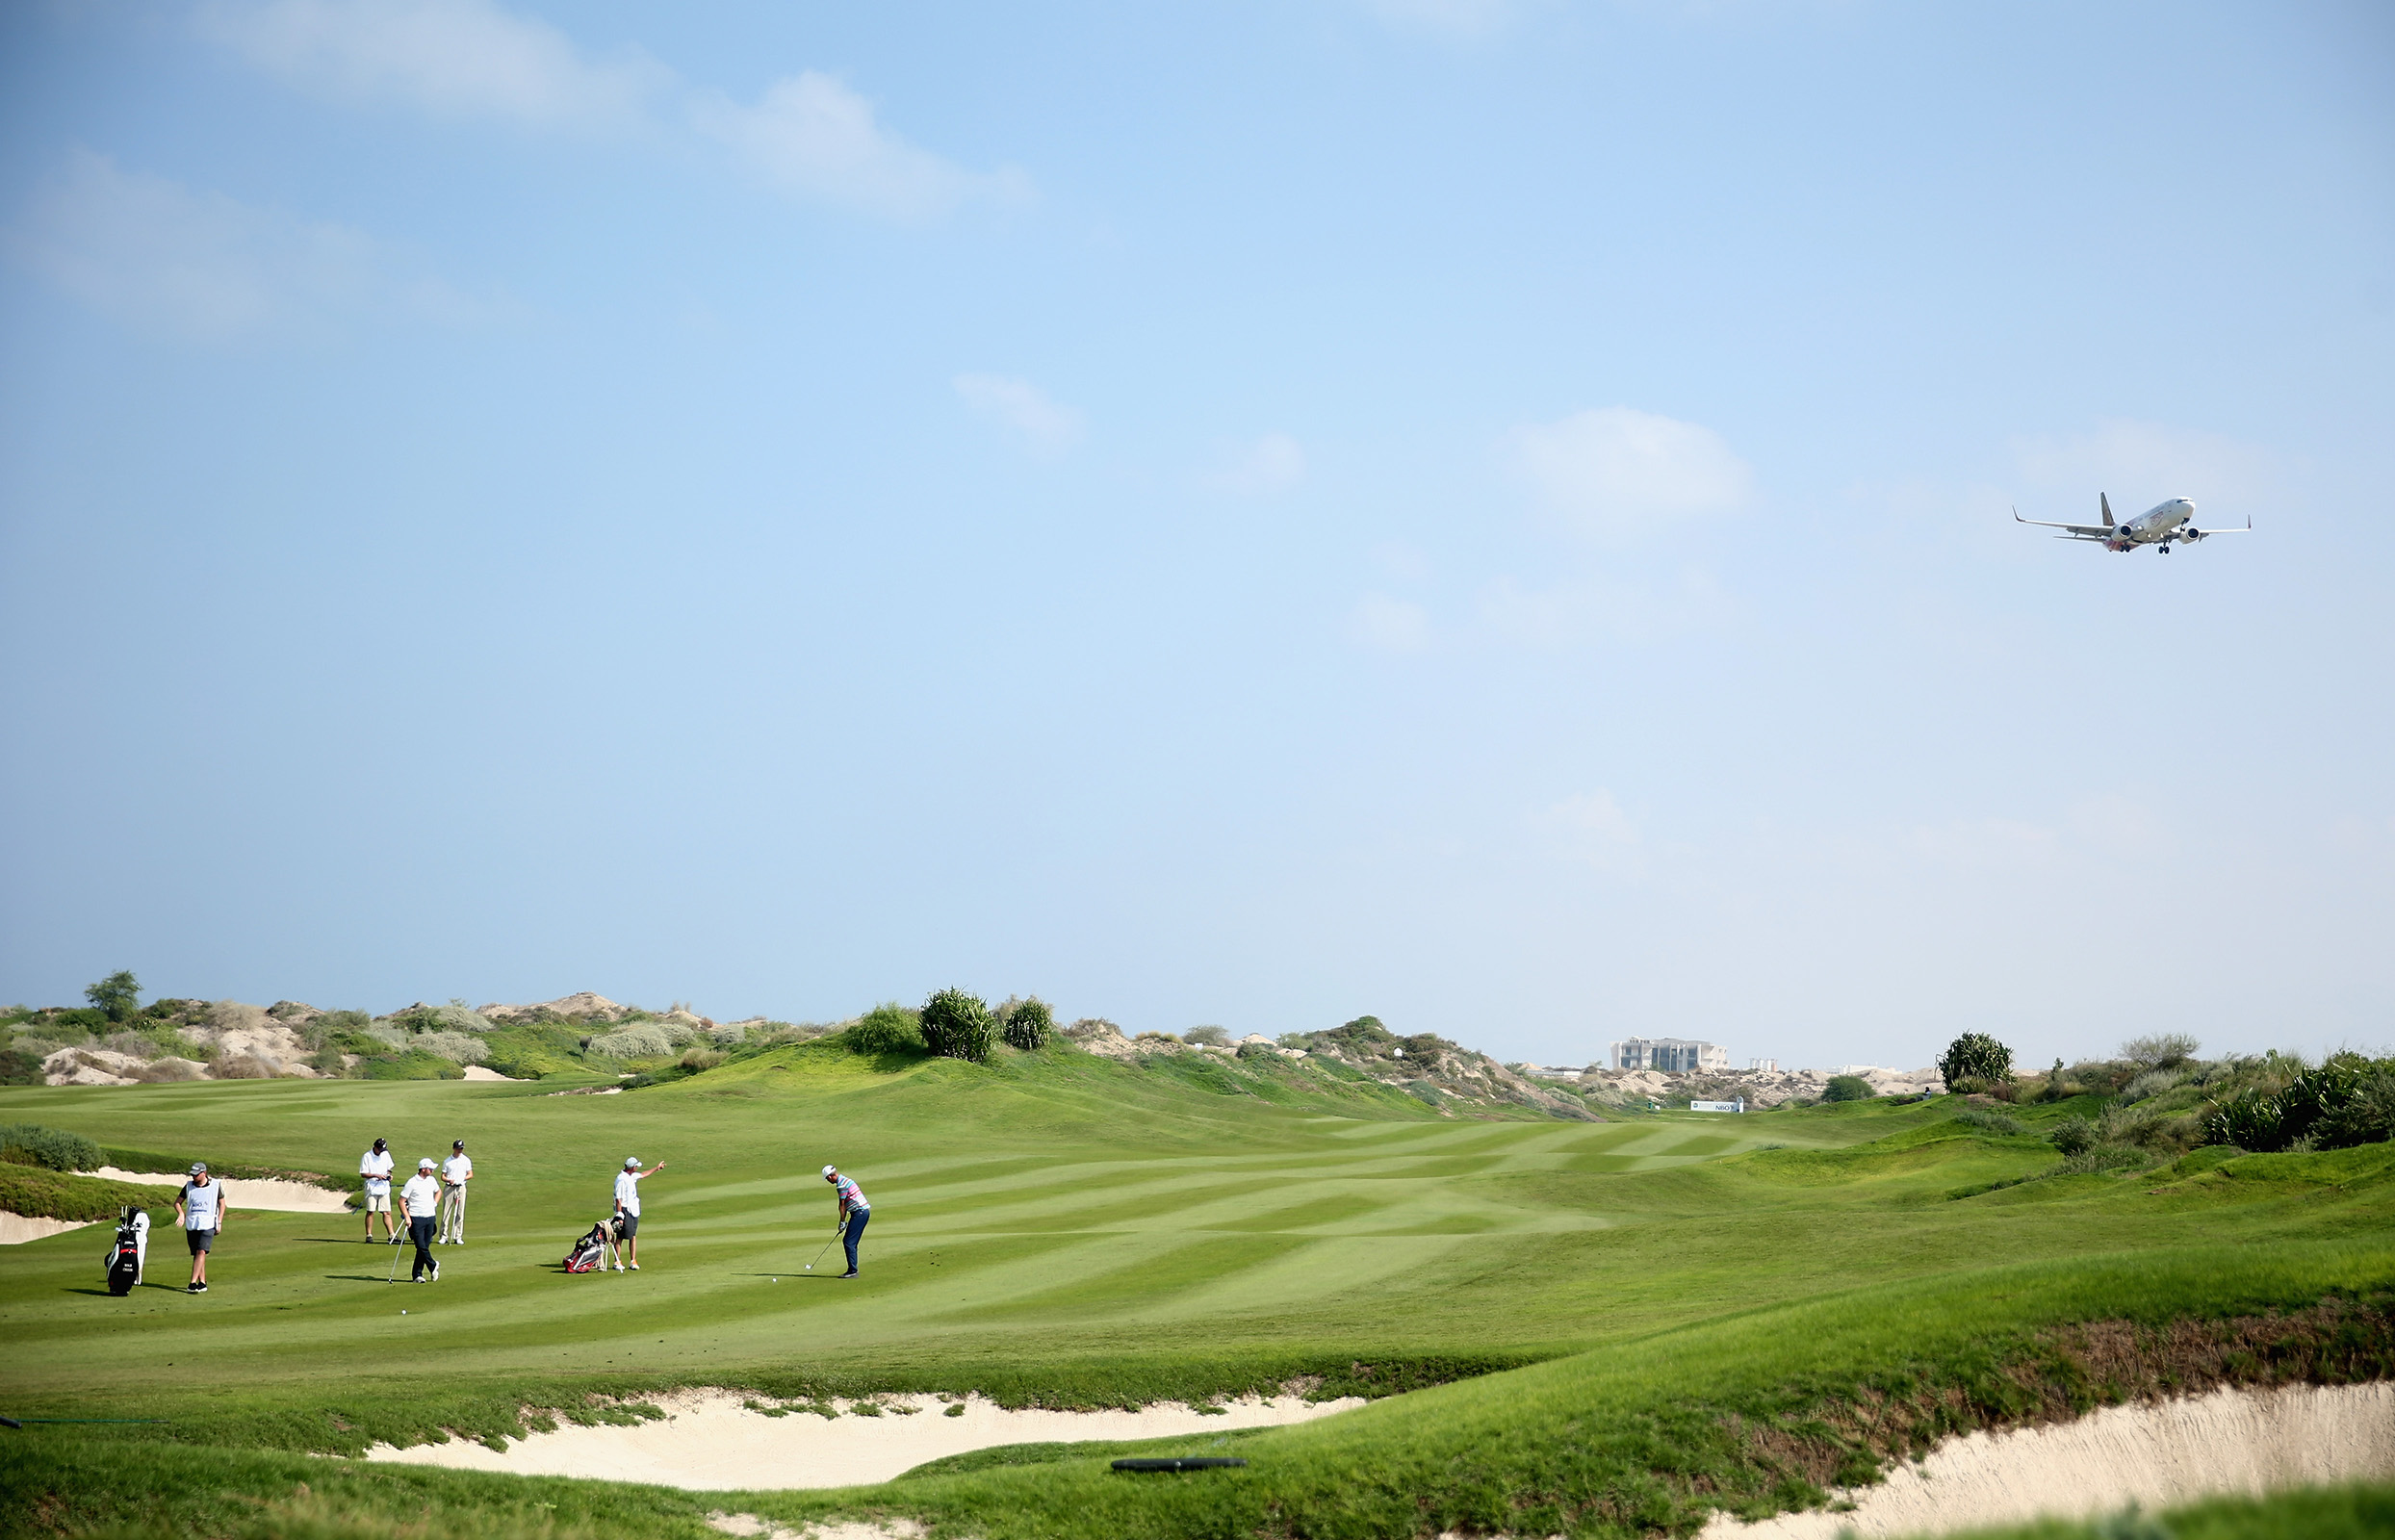 mizuno golf shoes size chart european masters qualifiers dubai